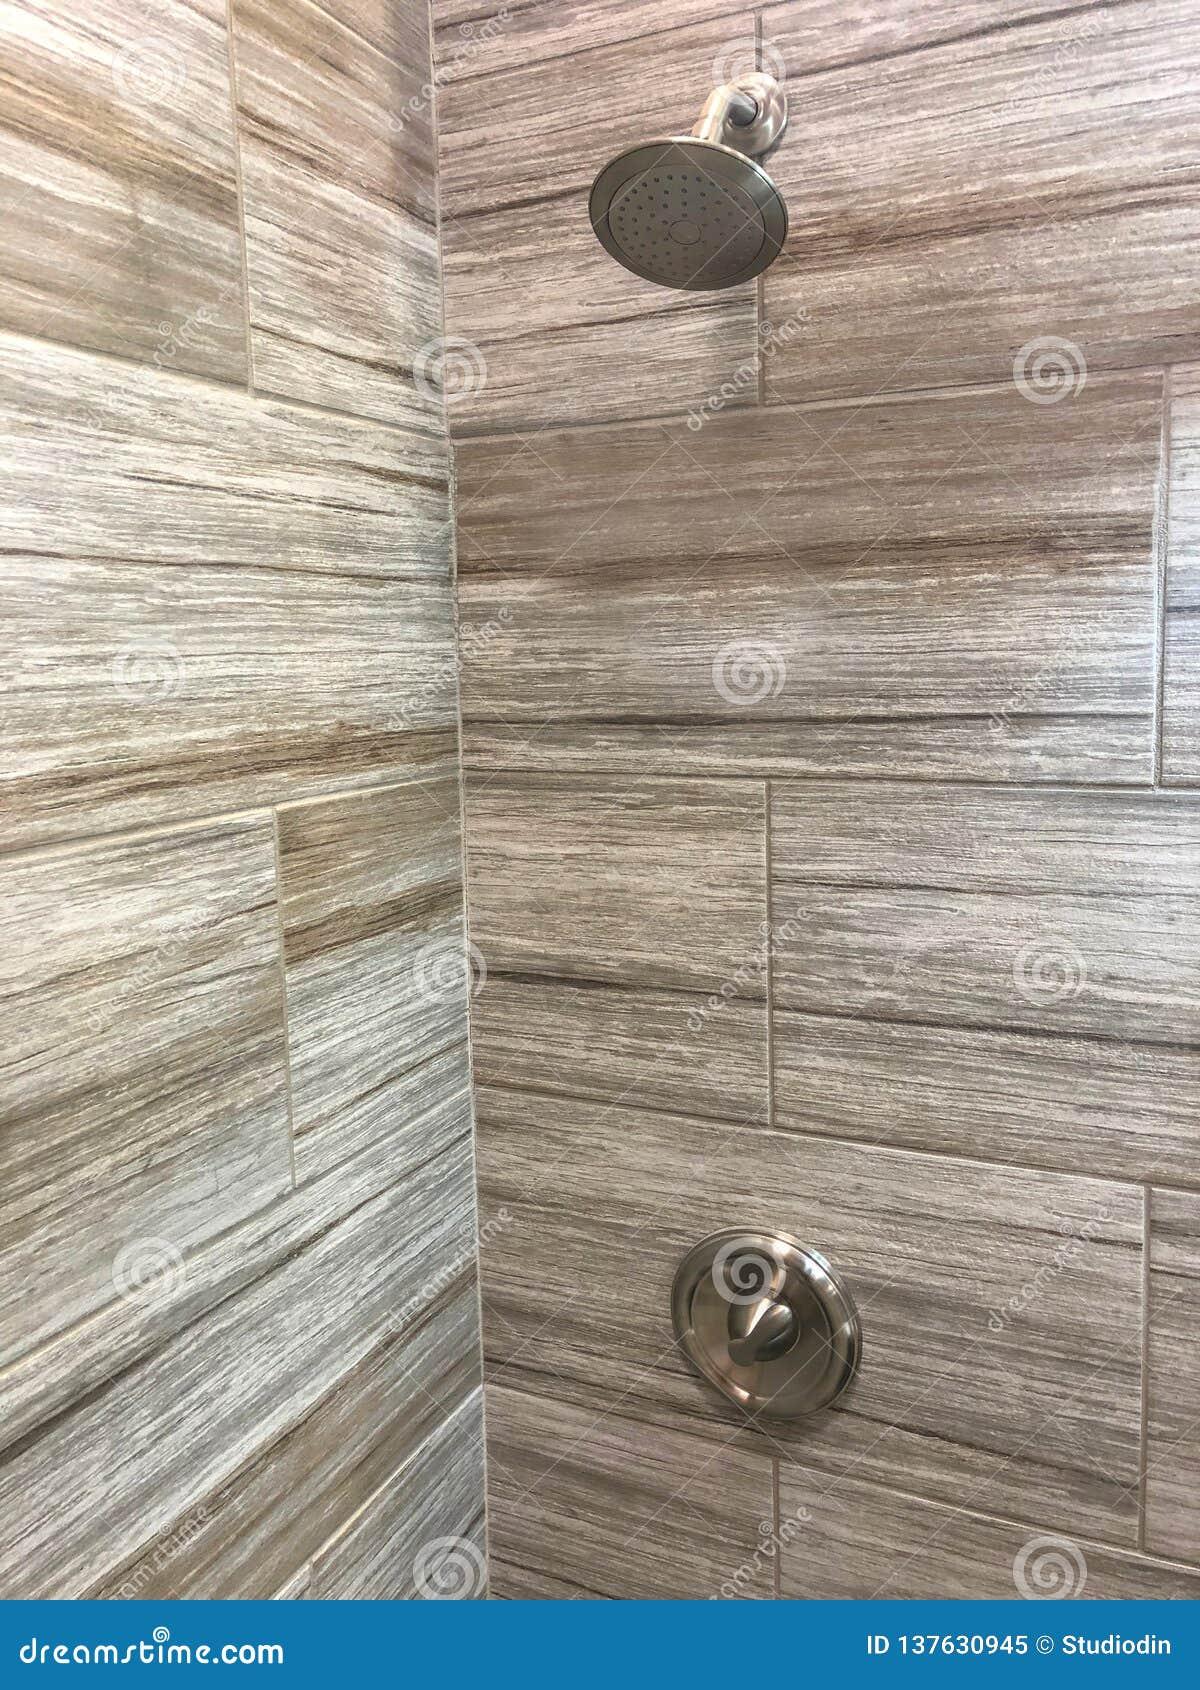 Shower tiles newly installed inside my bathroom